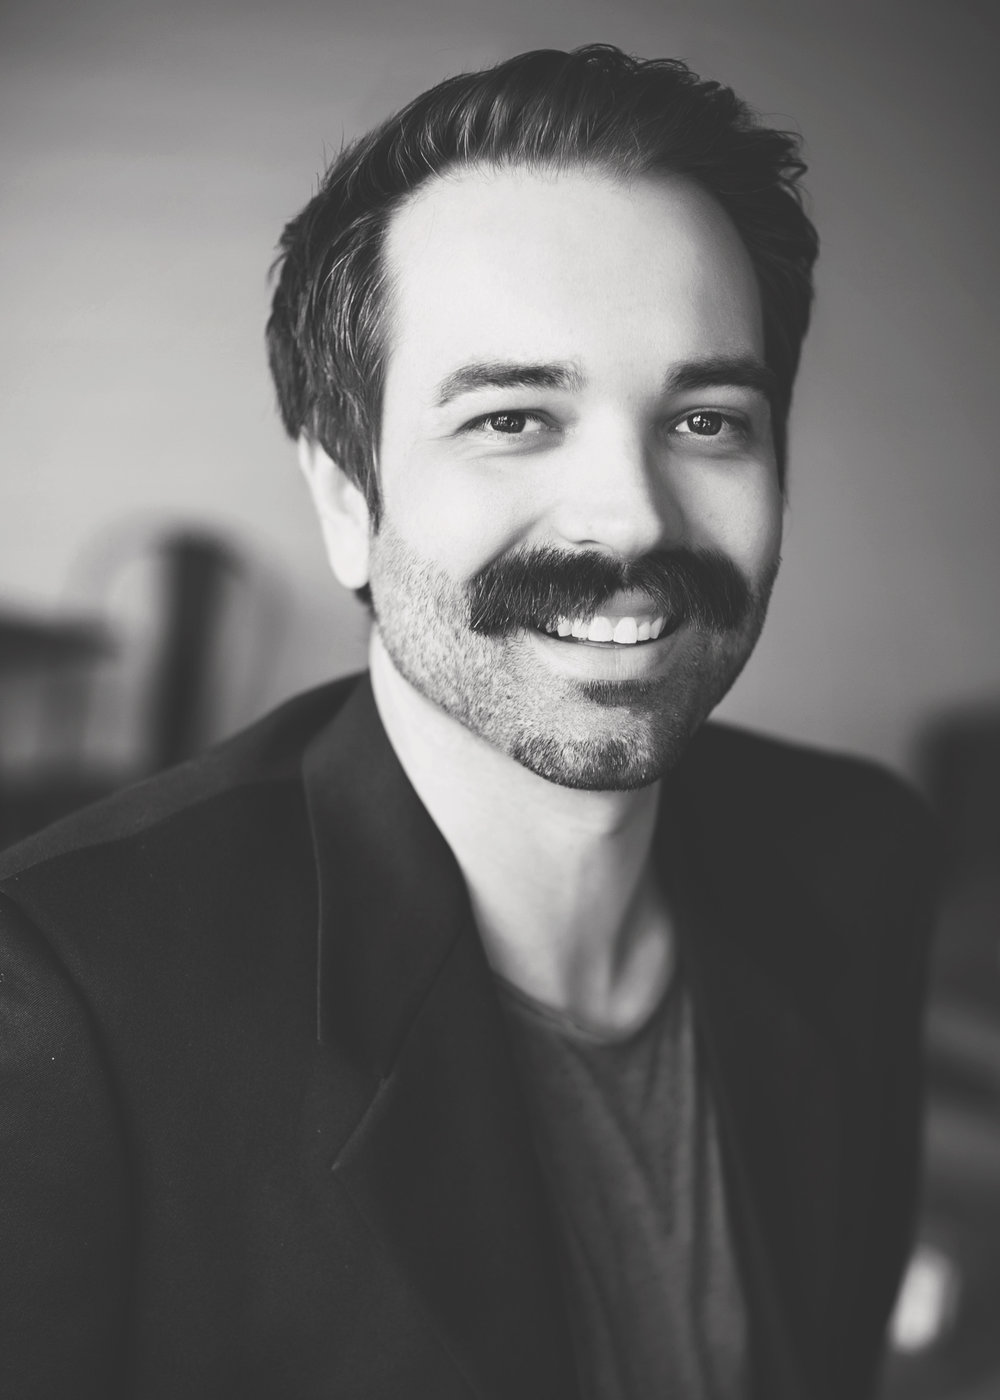 Jeremy Olson - Assistant Wedding Photographer Extraordinaire